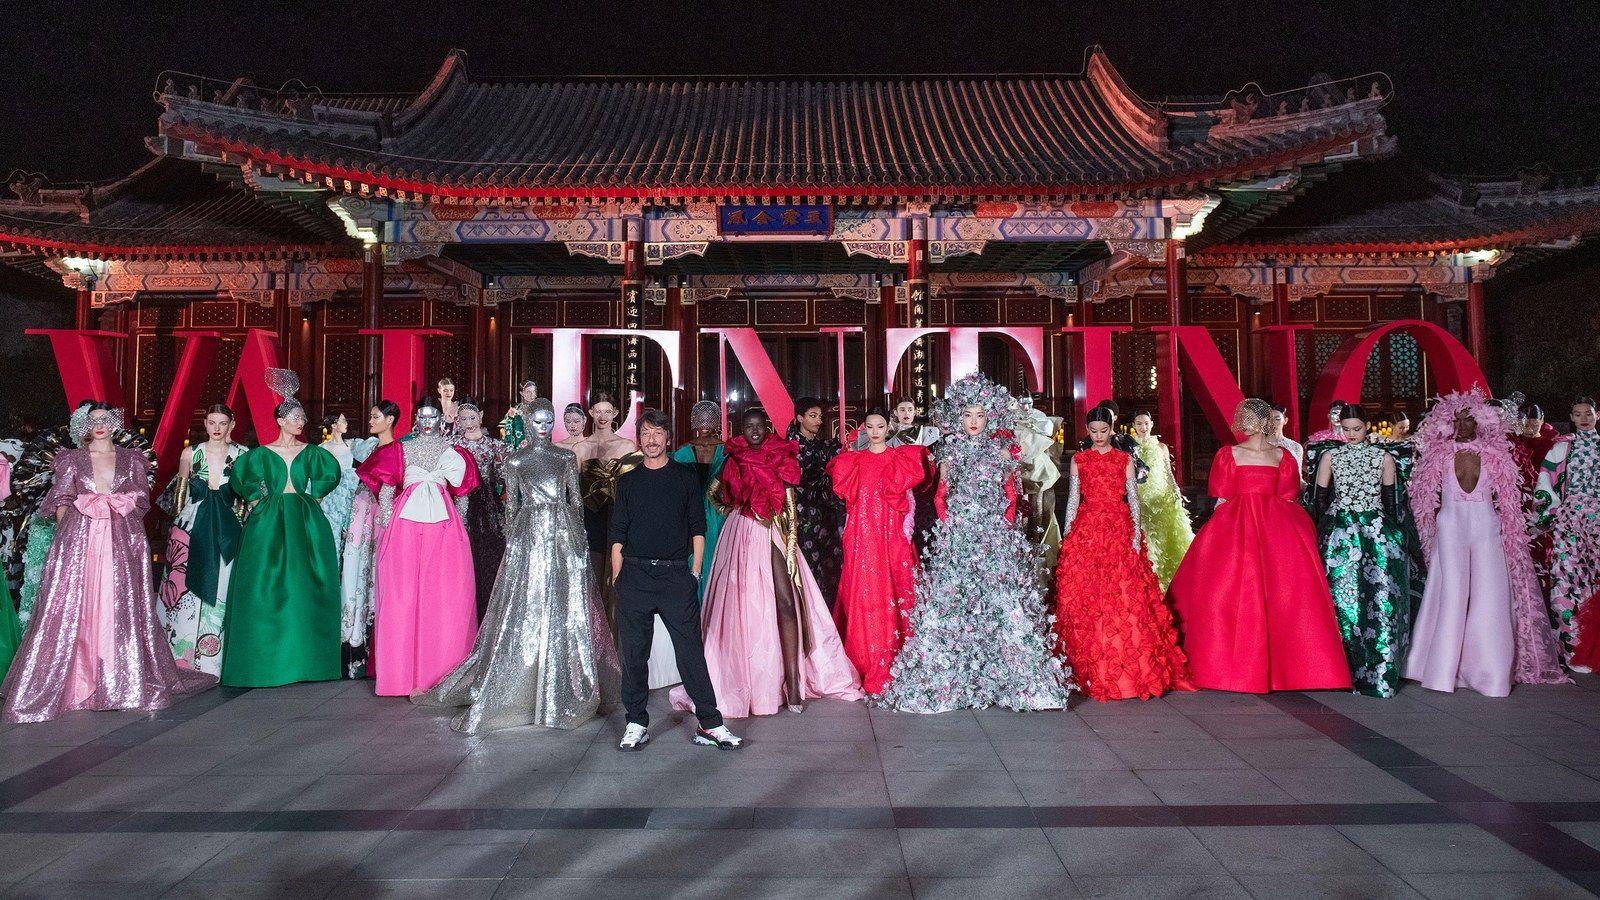 """DayDream""一場融合東西方文化的紅樓夢境,Valentino高級訂製服北京頤和園夢幻上演!"